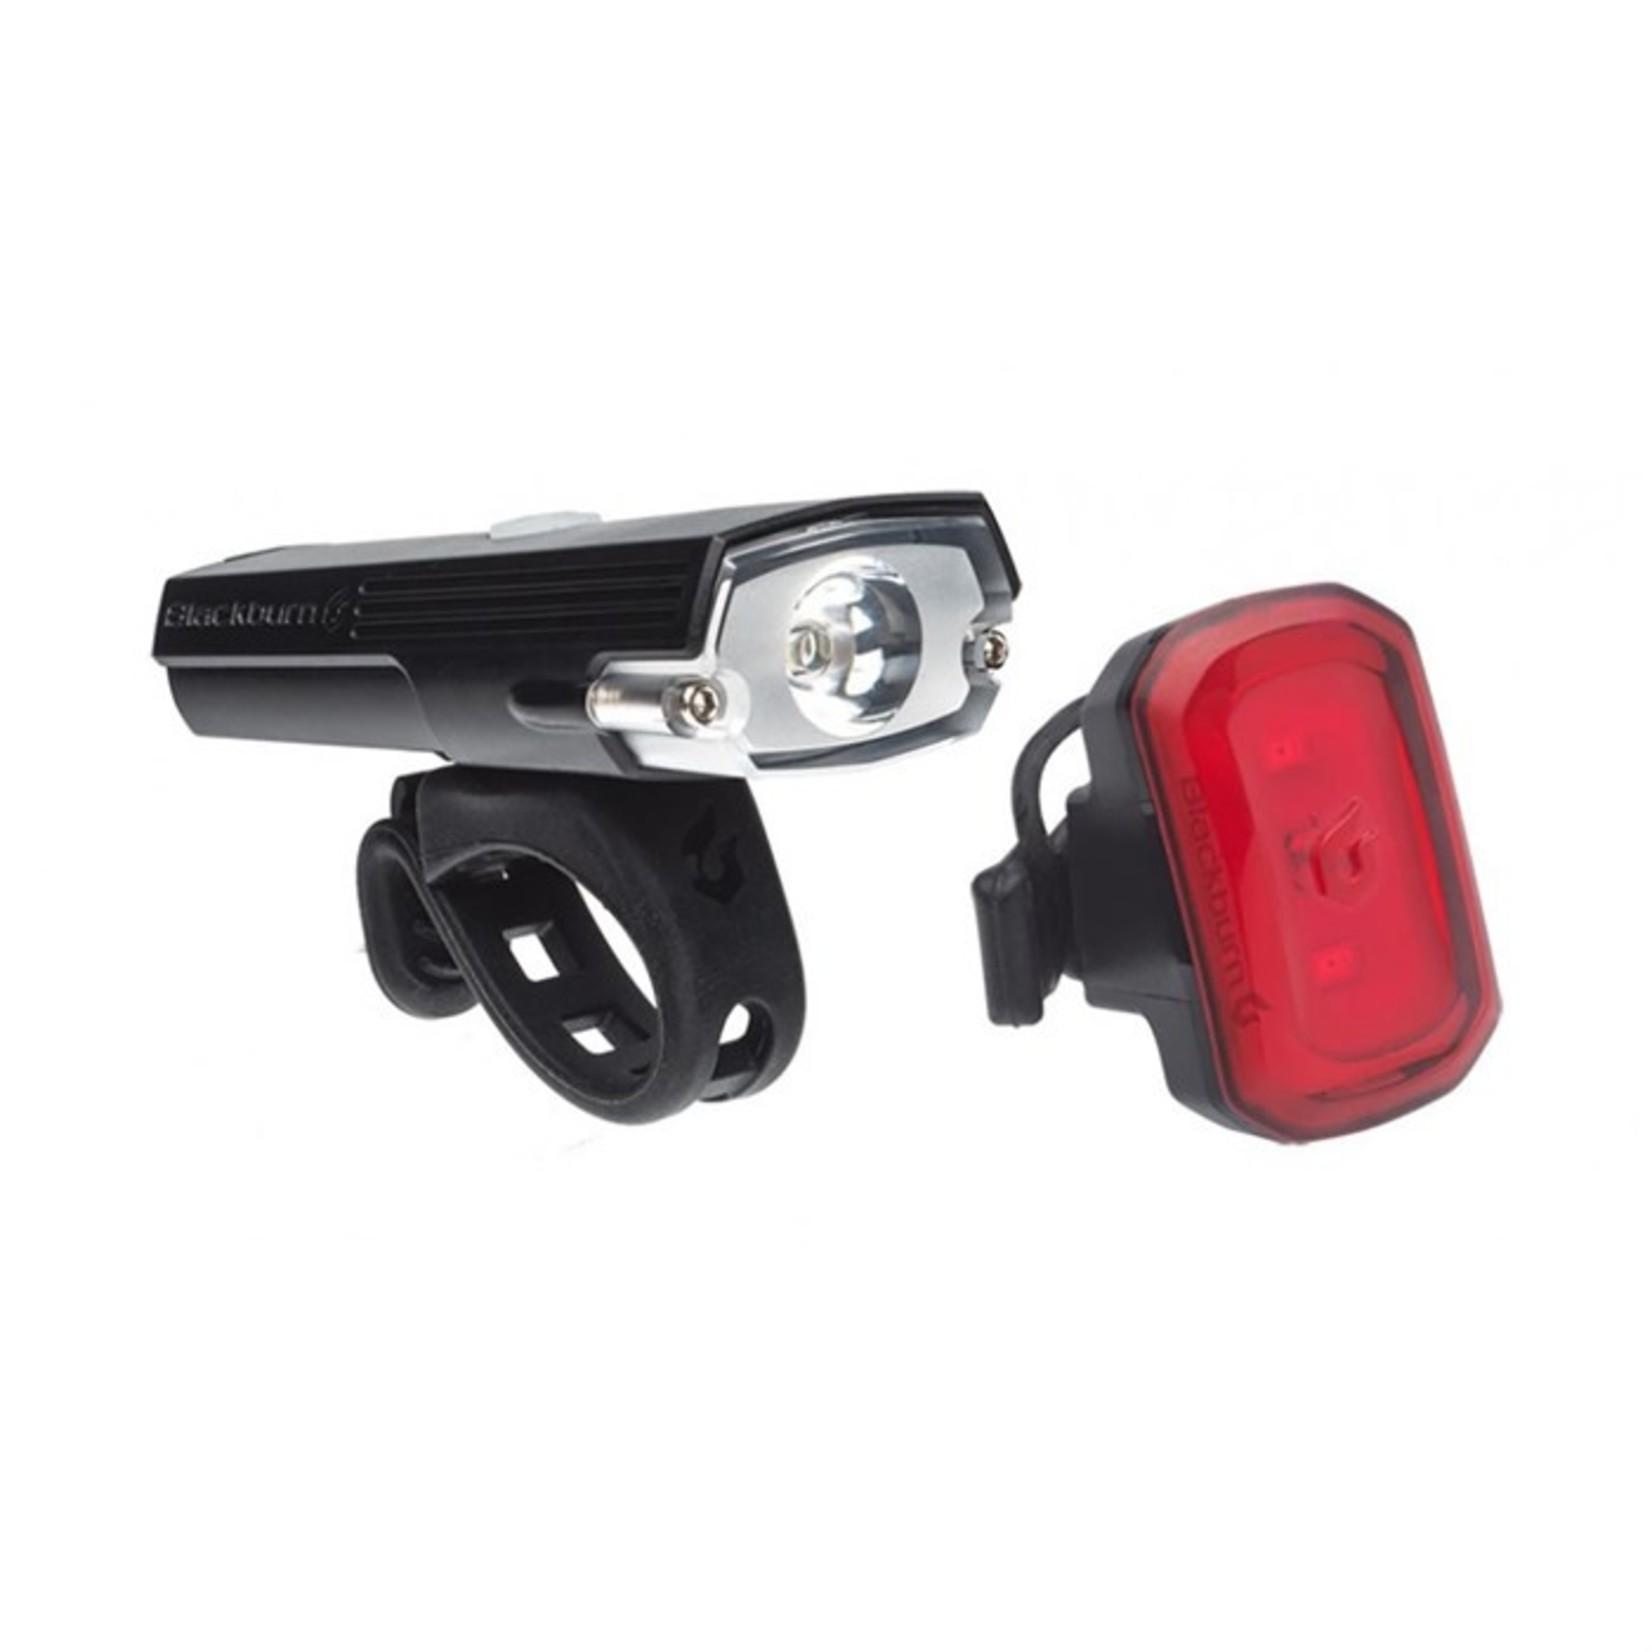 BLACKBURN Bike Lights-DayBlazer 400 Front and Click USB Rear